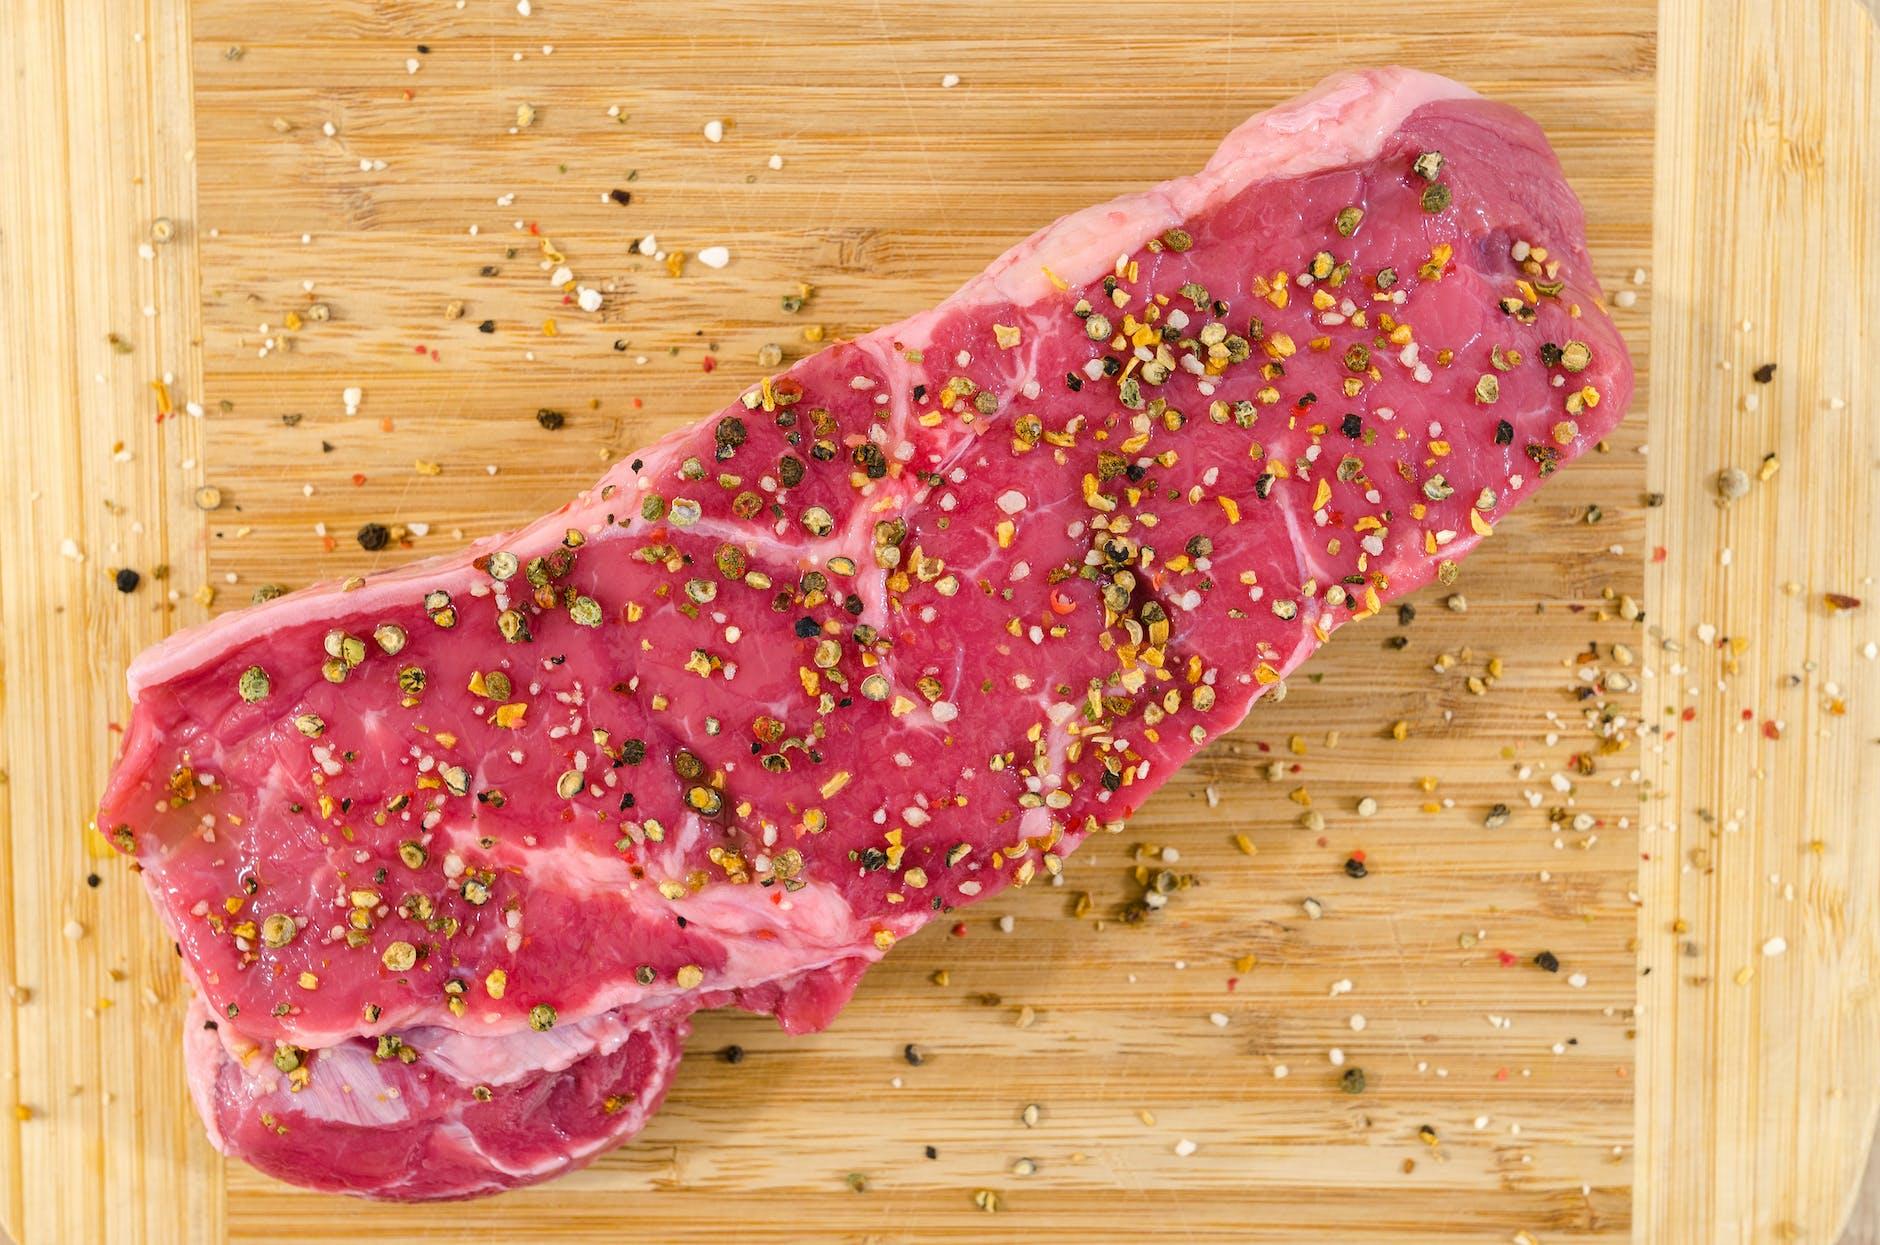 Tomahawk Steak Cut: